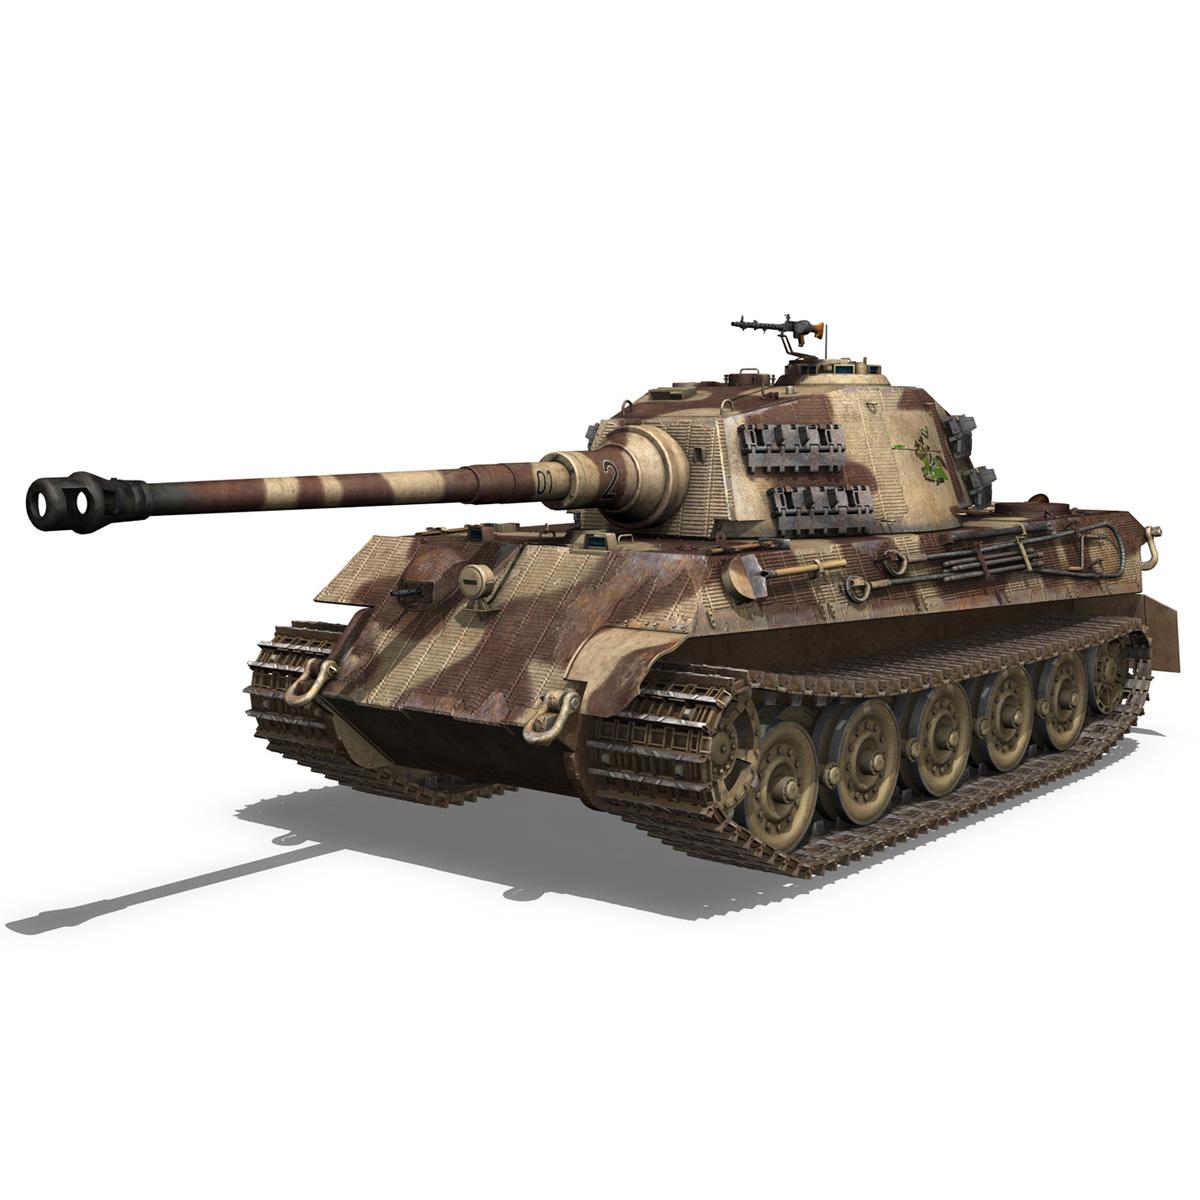 panzerkampfwagen vi – ausf b – tiger ii – 201 3d model 3ds c4d lwo lw lws obj 293302